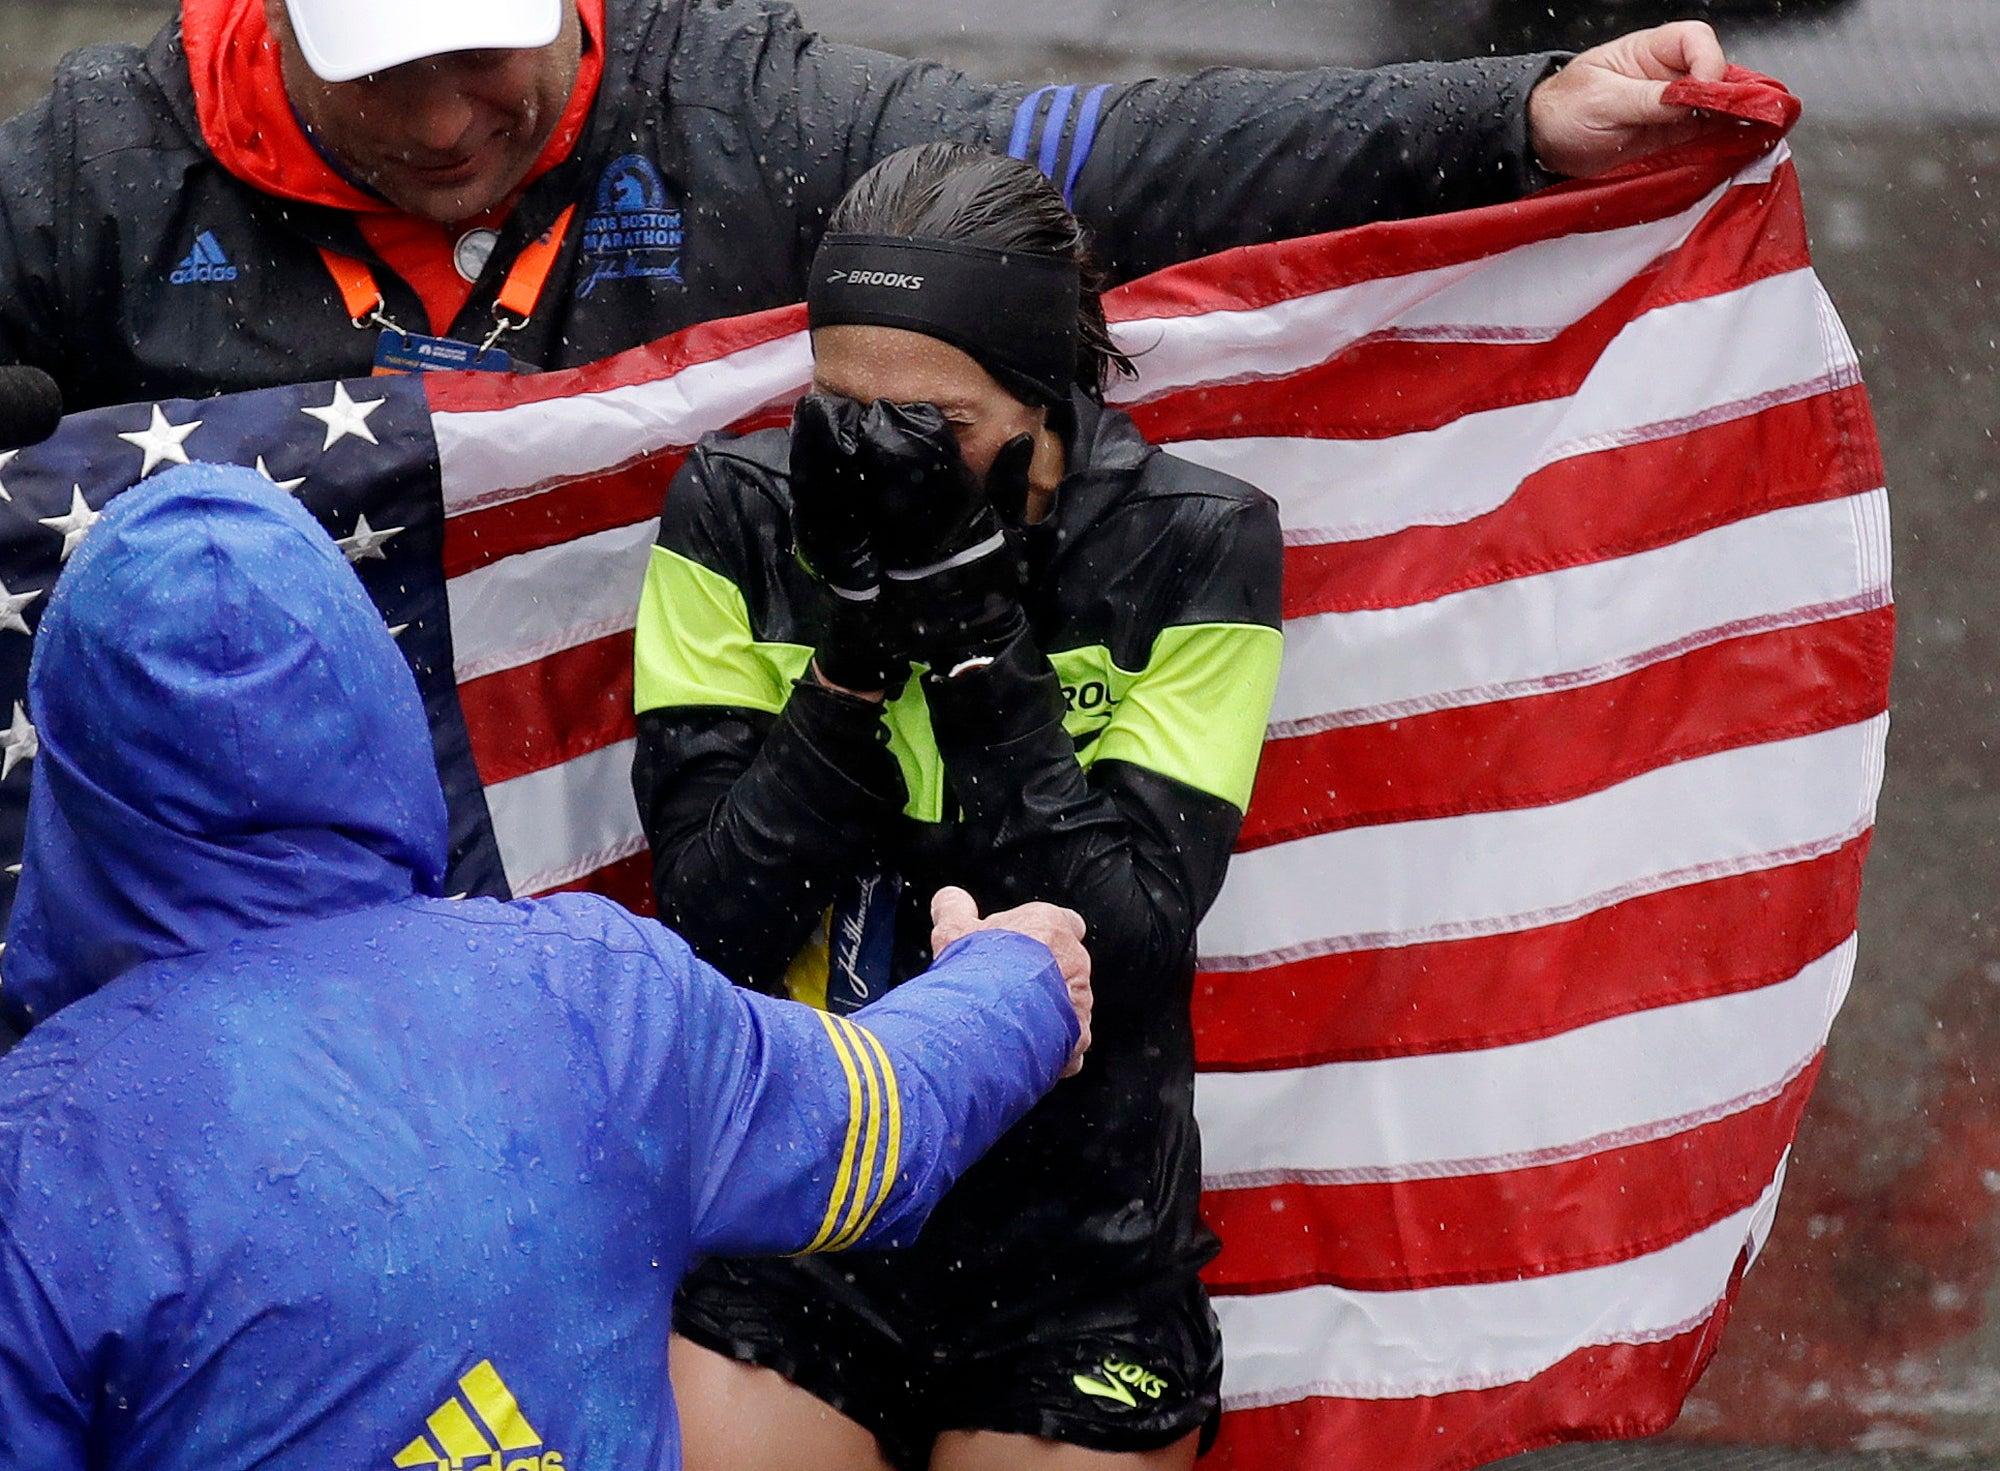 Desiree Linden, of Washington, Mich., celebrates after winning the women's division of the 122nd Boston Marathon.